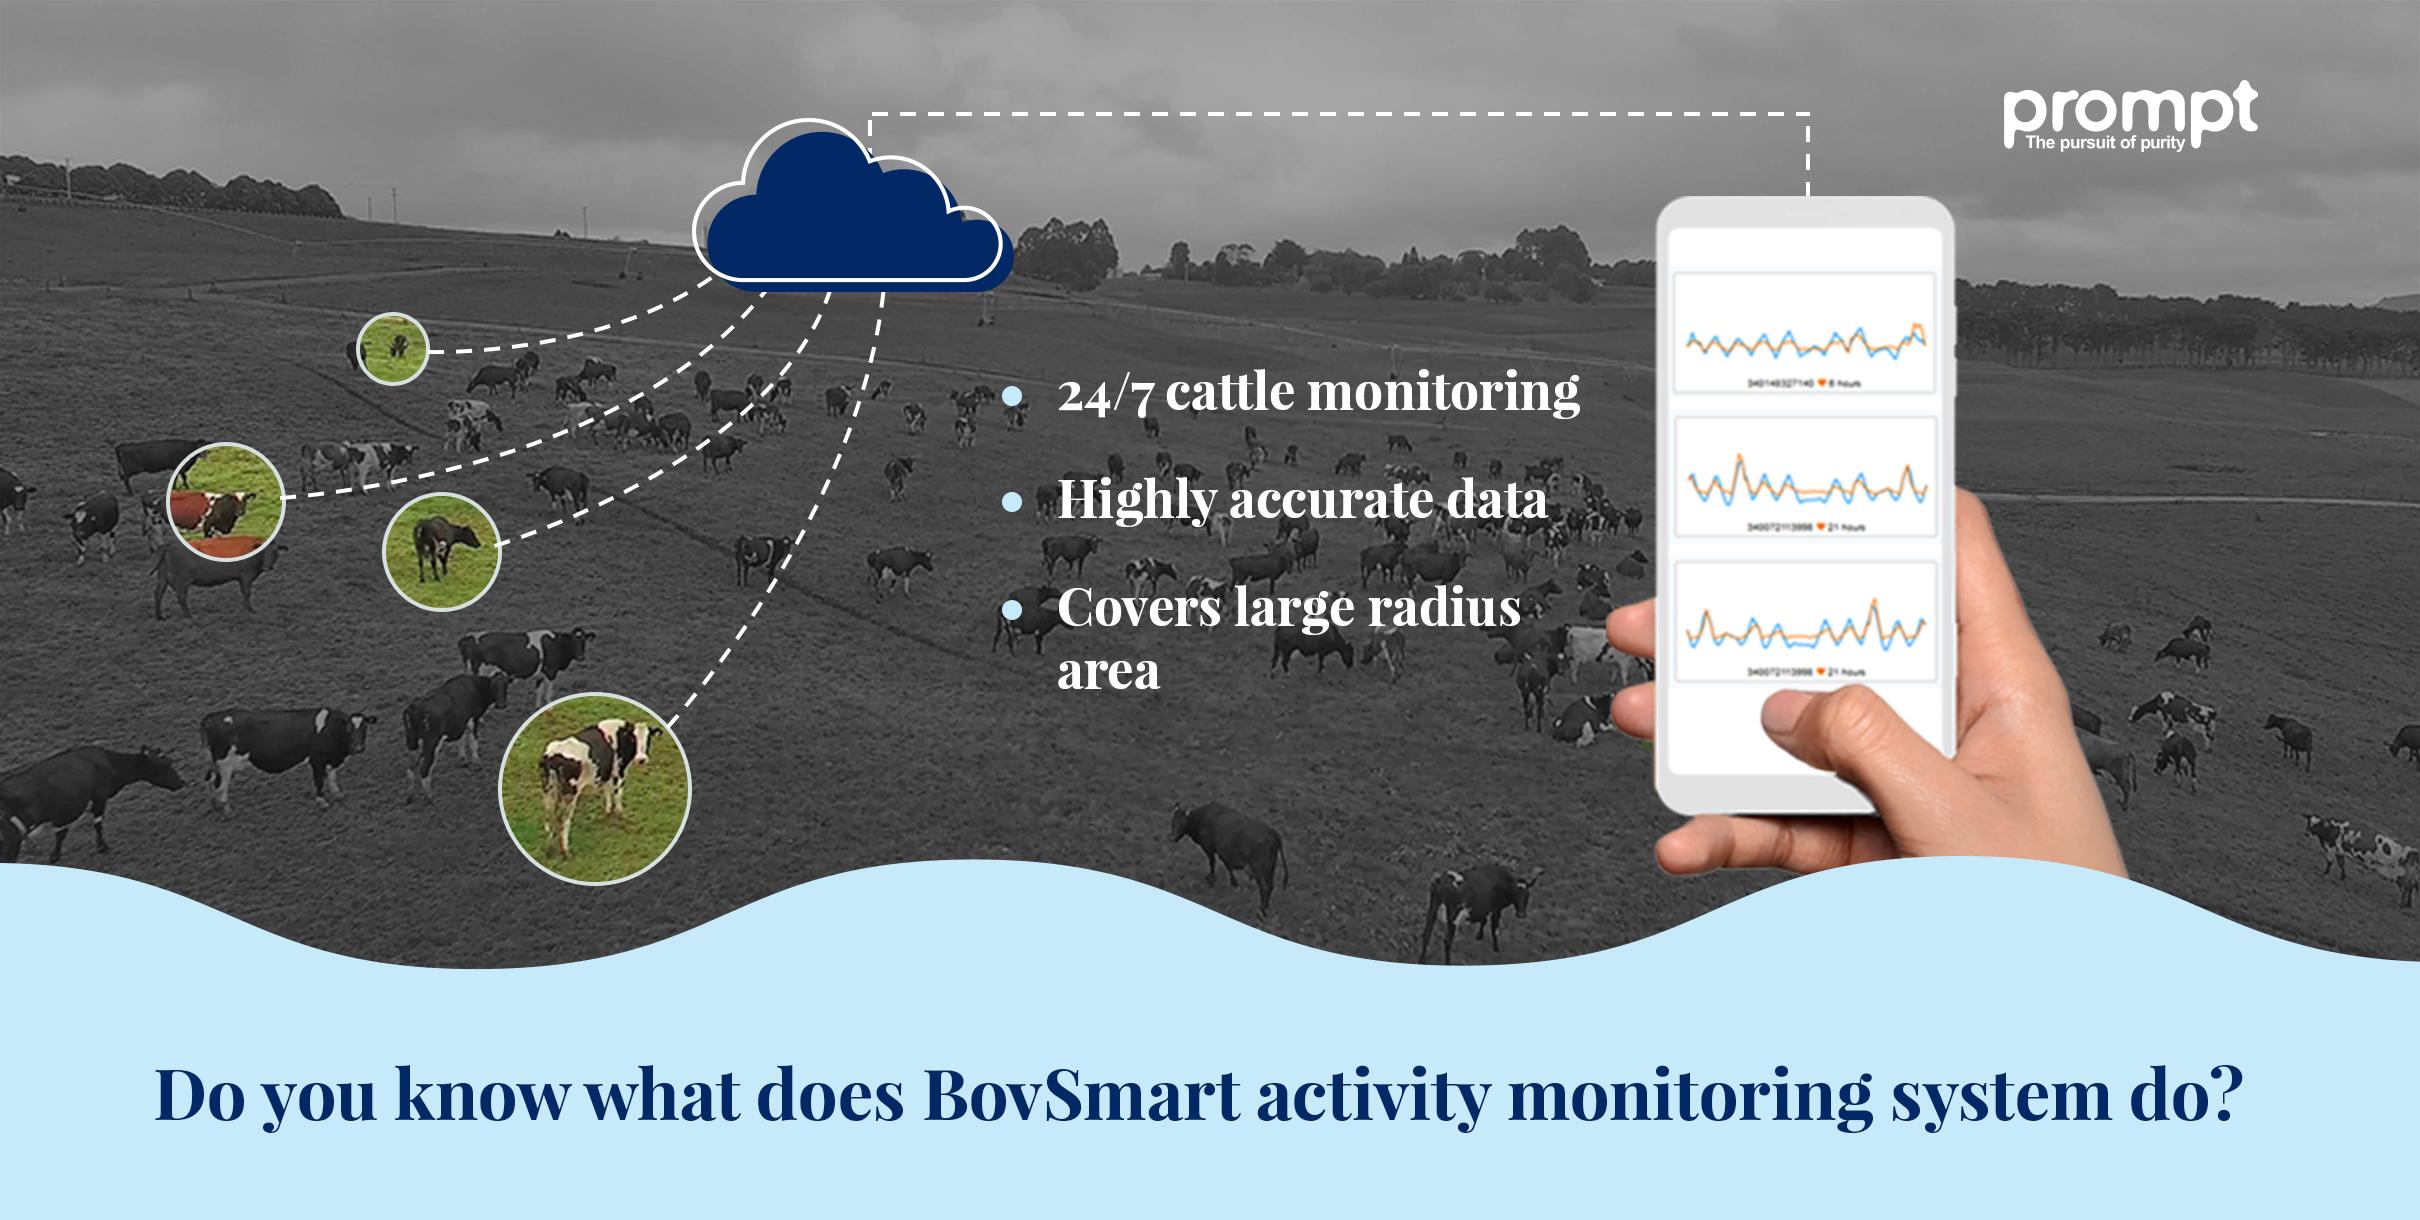 BovSmart - Cattle monitoring system